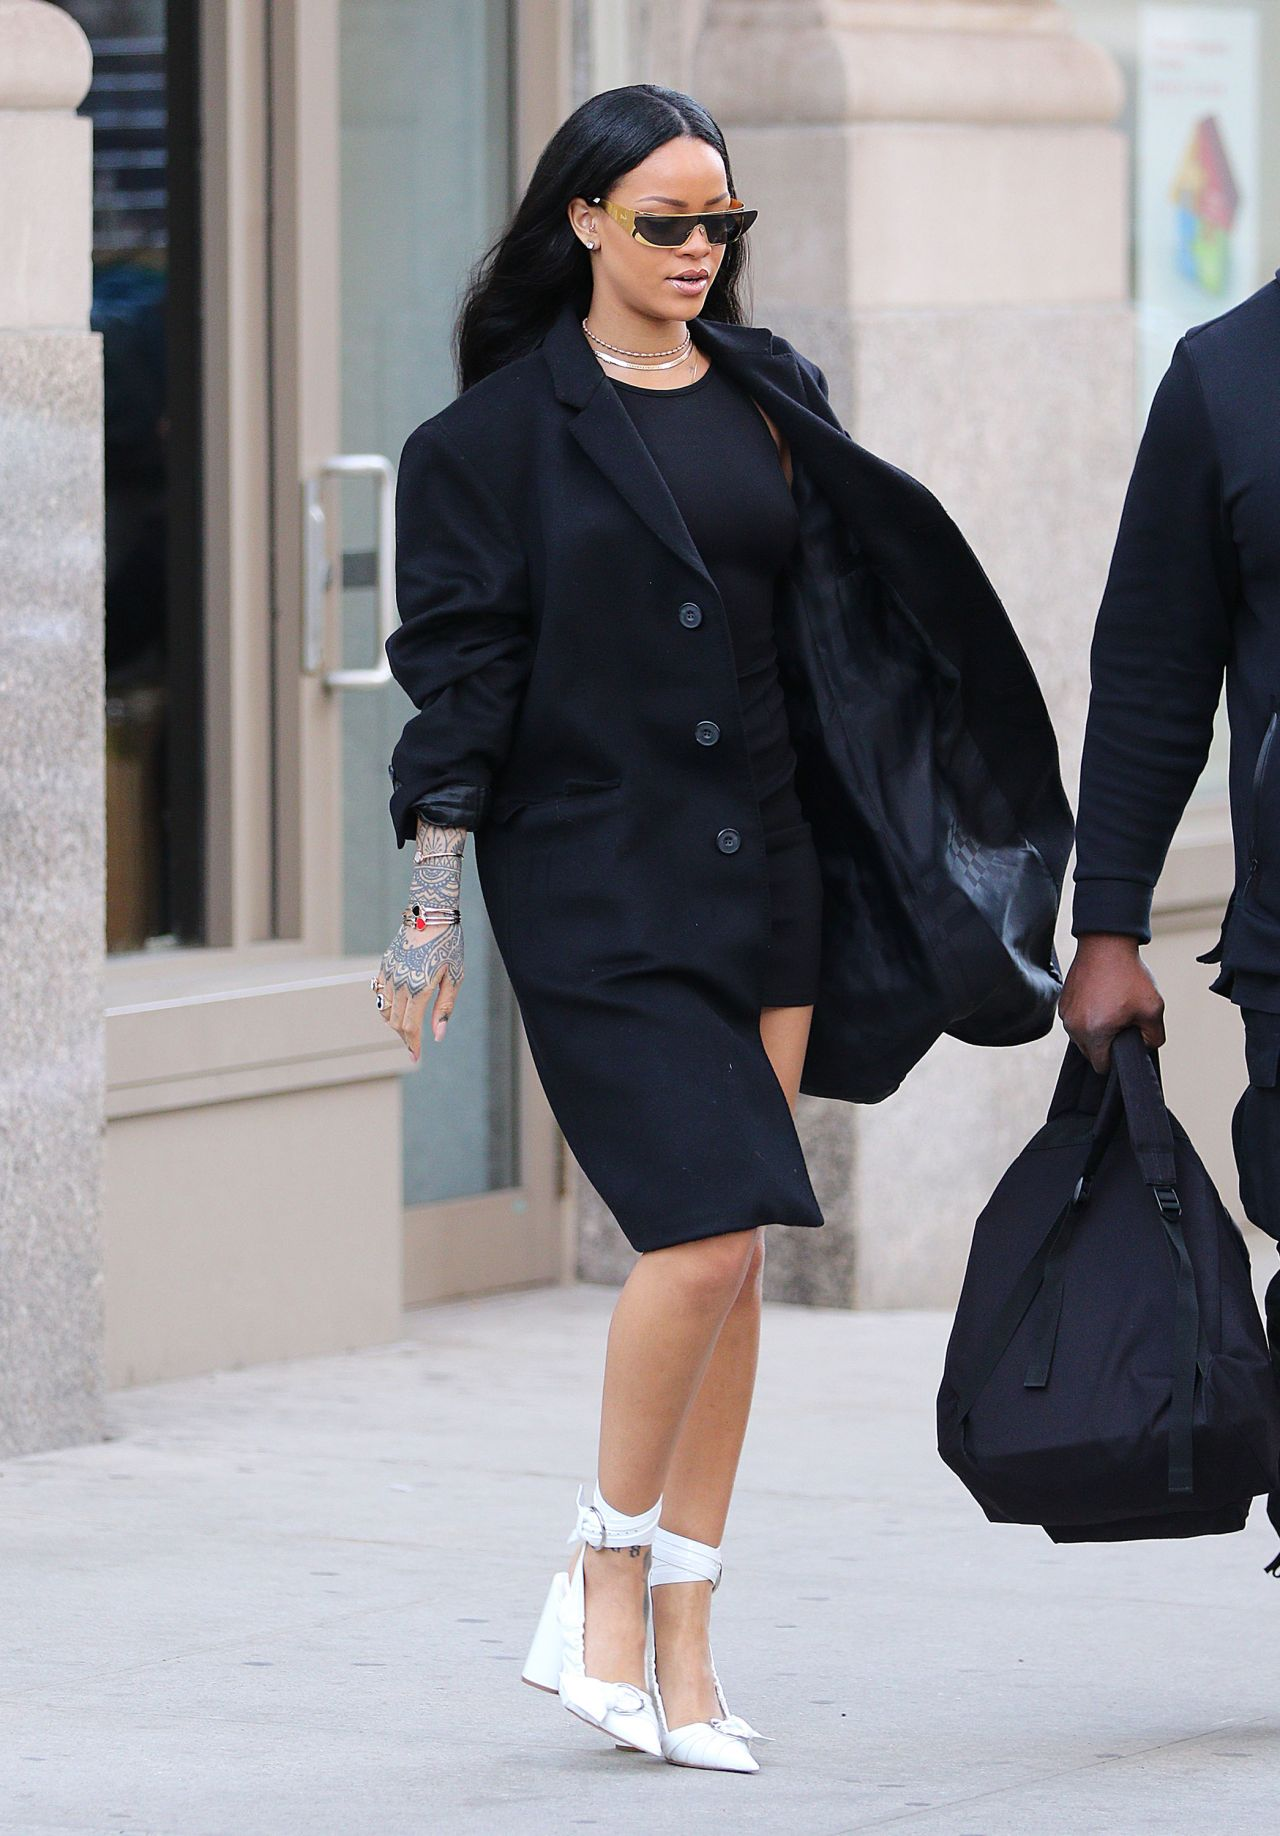 Rihanna Street Fashion New York City 3 30 2016